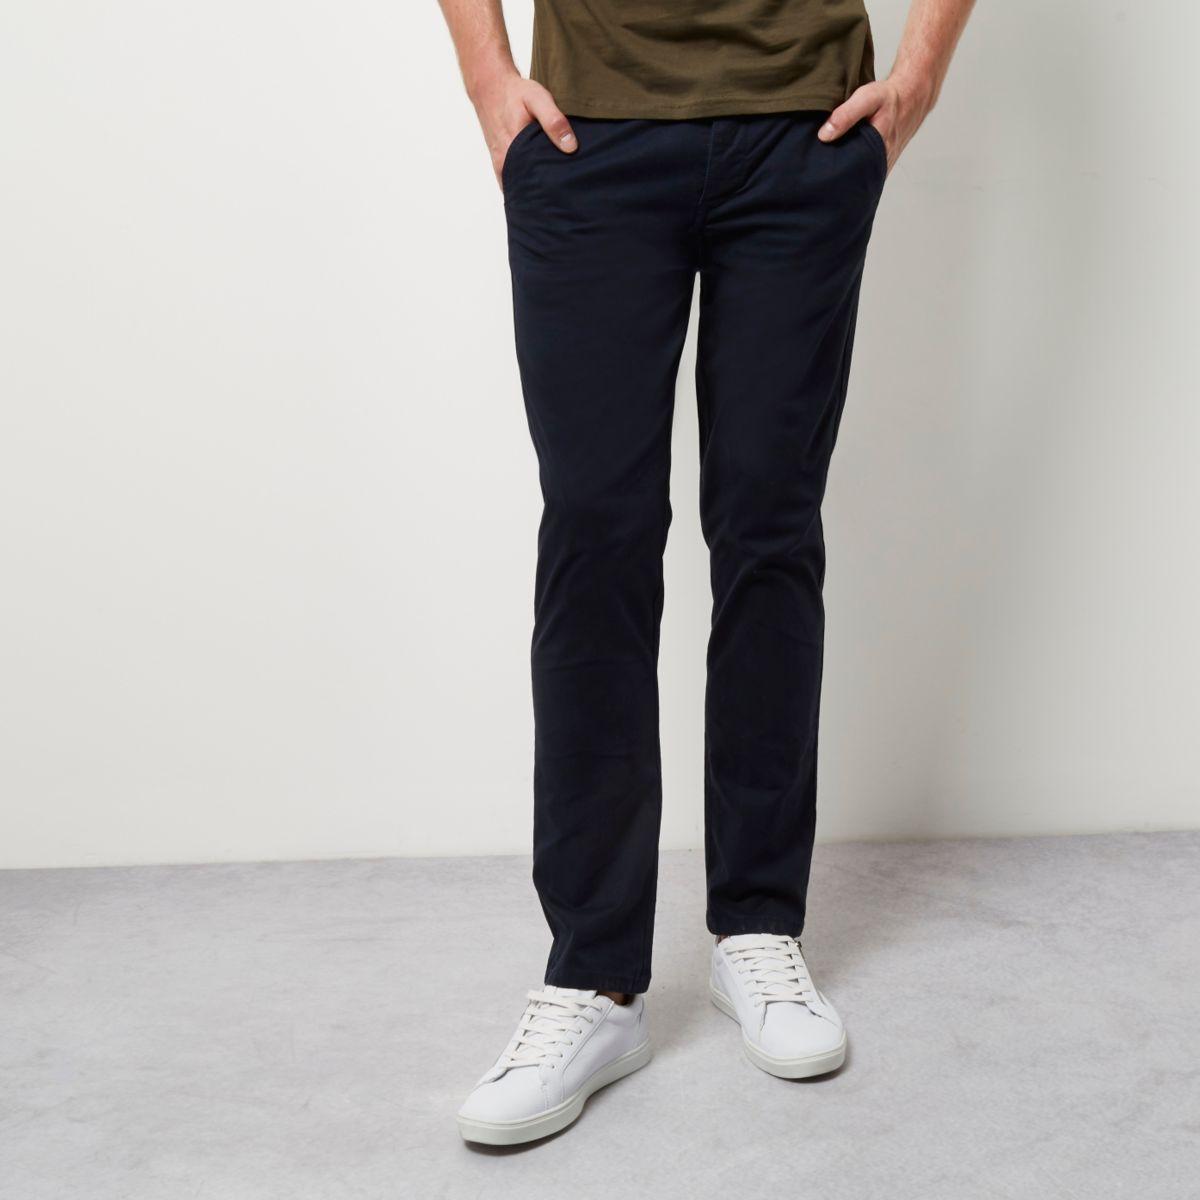 Navy stretch slim chino pants